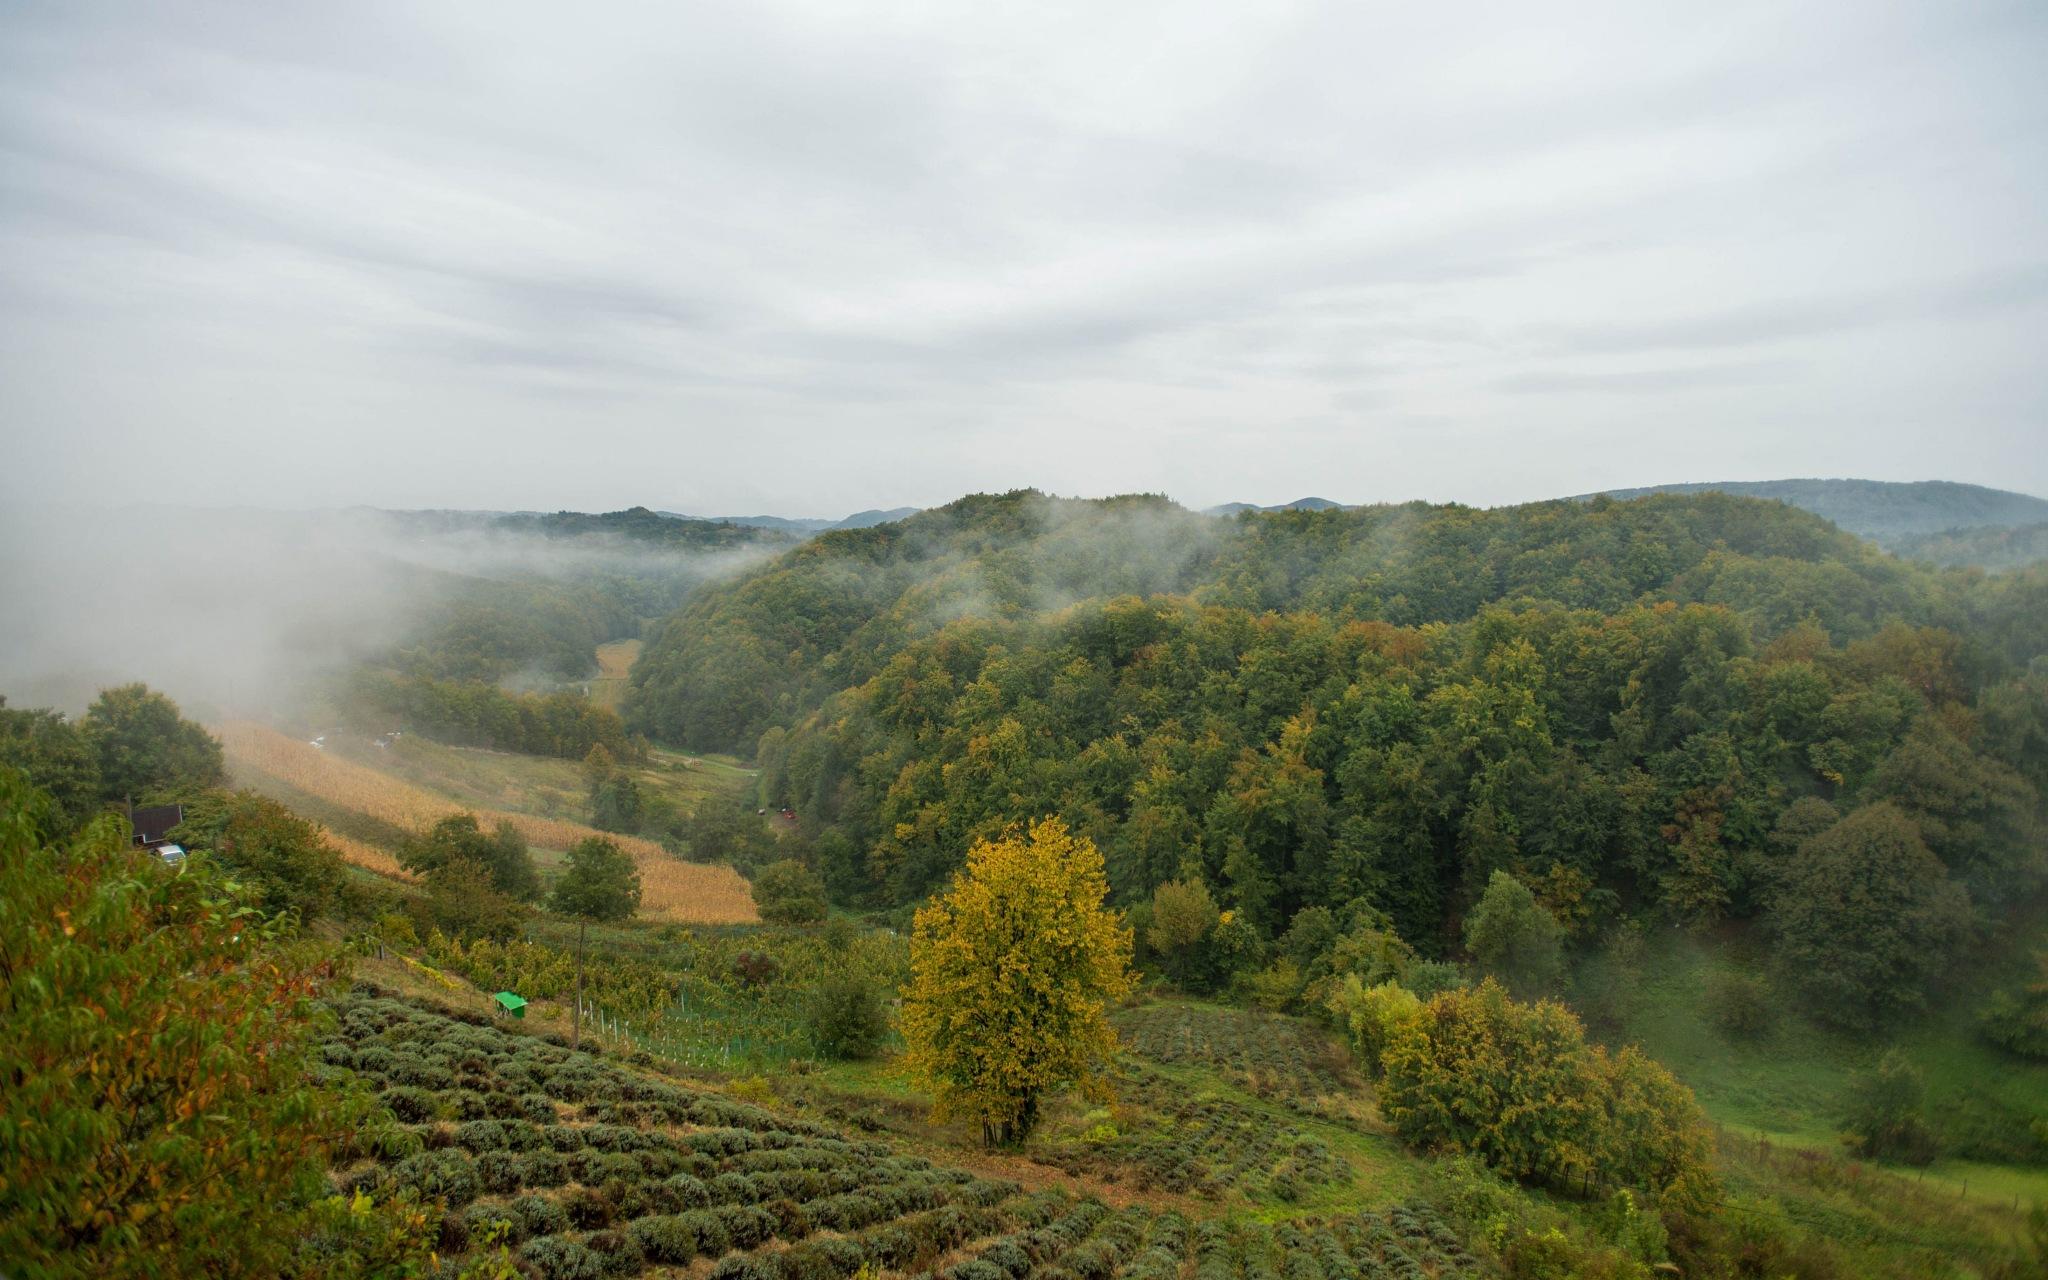 misty day by Vlado Ferencic